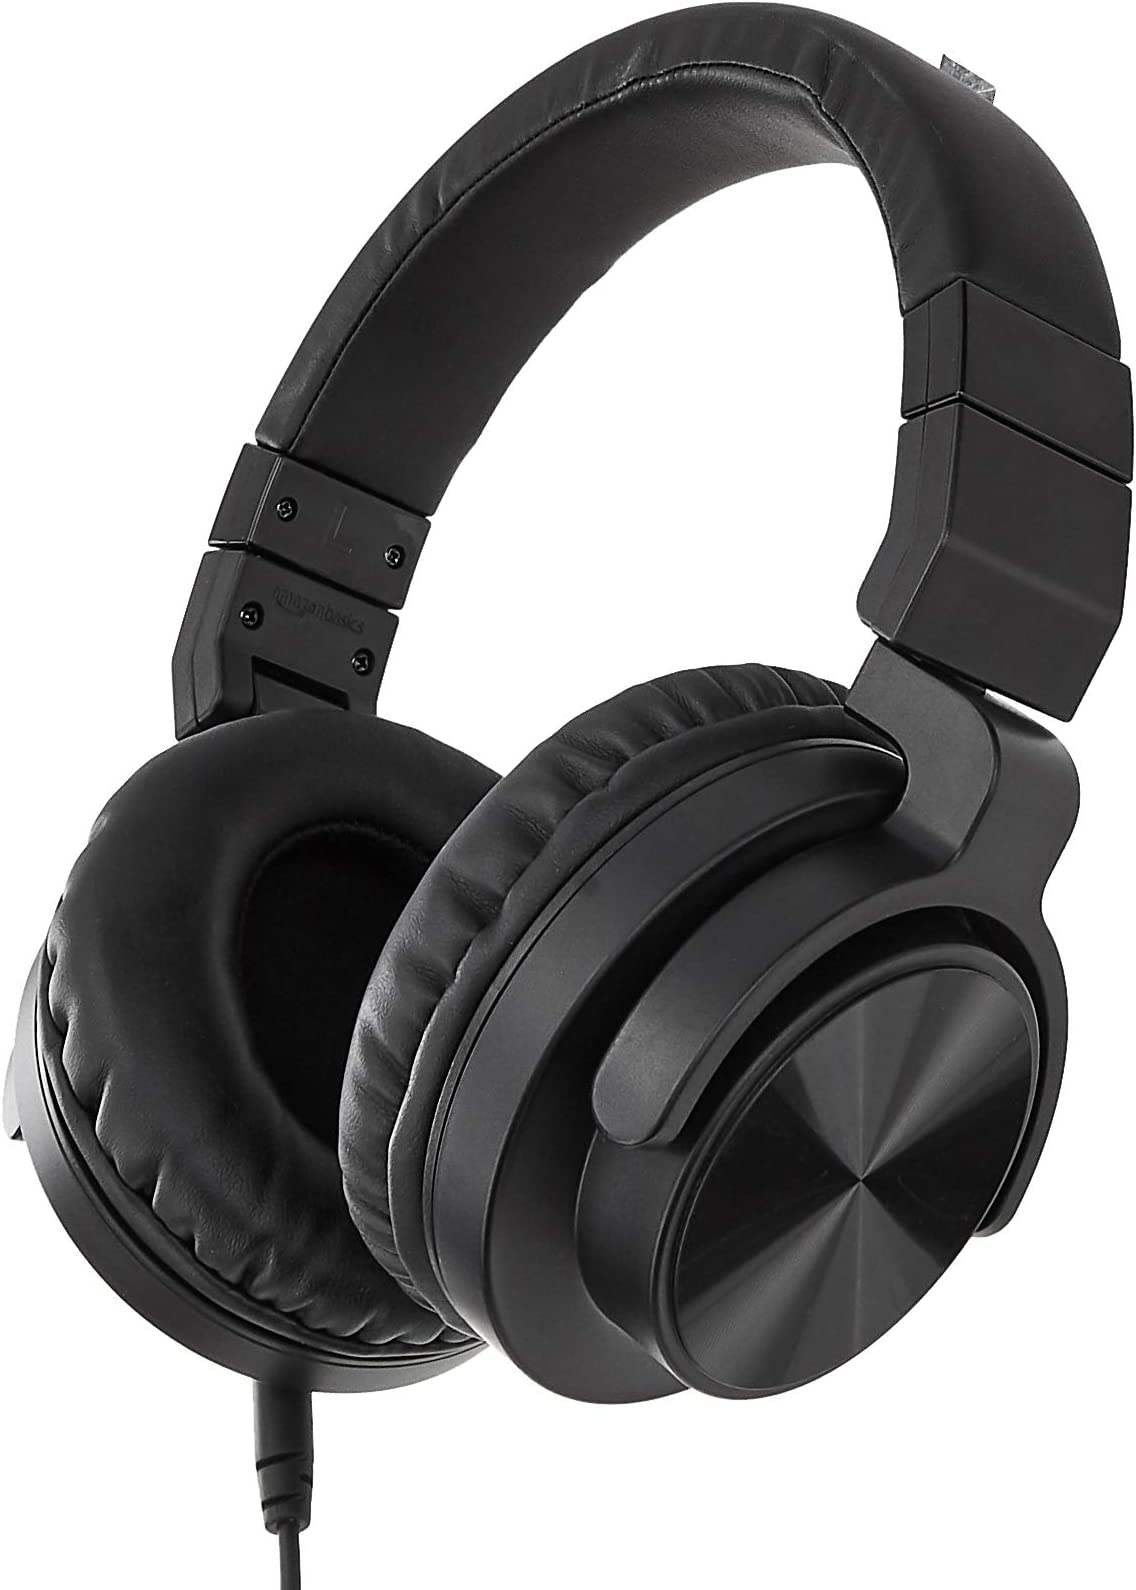 Amazon Basics Over-Ear Studio Monitor Headphones - Black